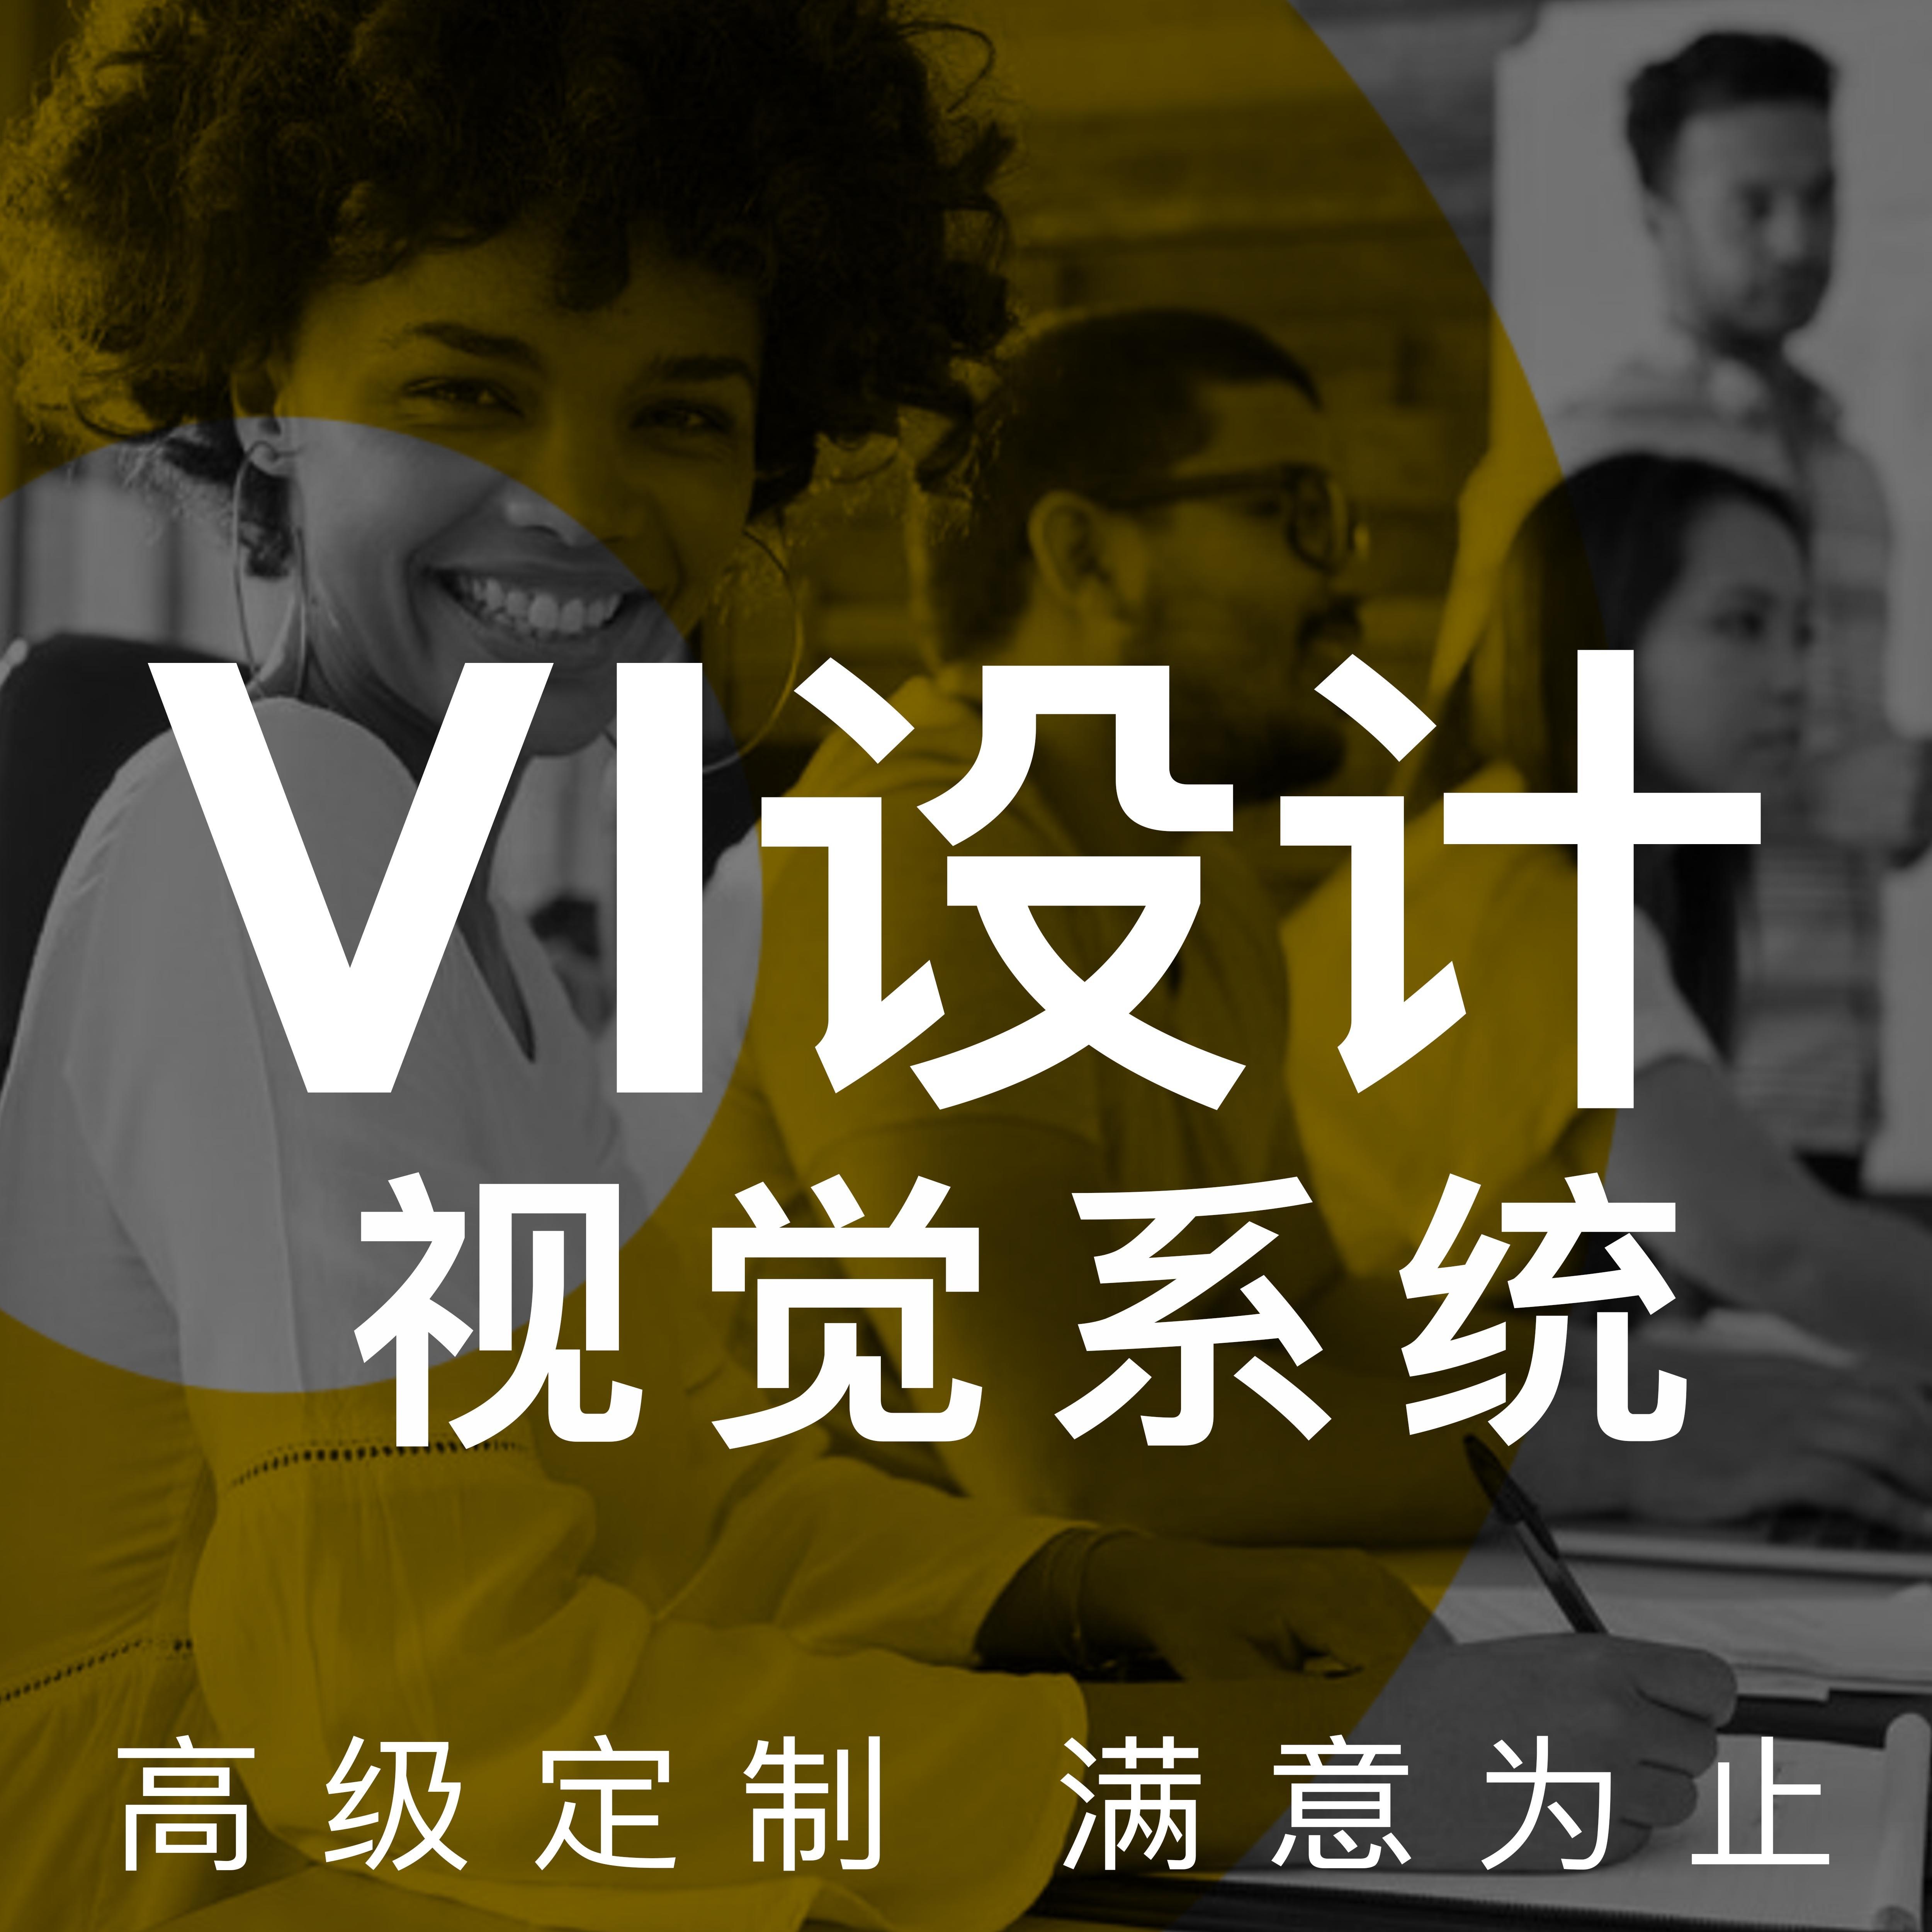 VI 系统定制奶制品包装 设计 3款&IP形象 设计 企业定制